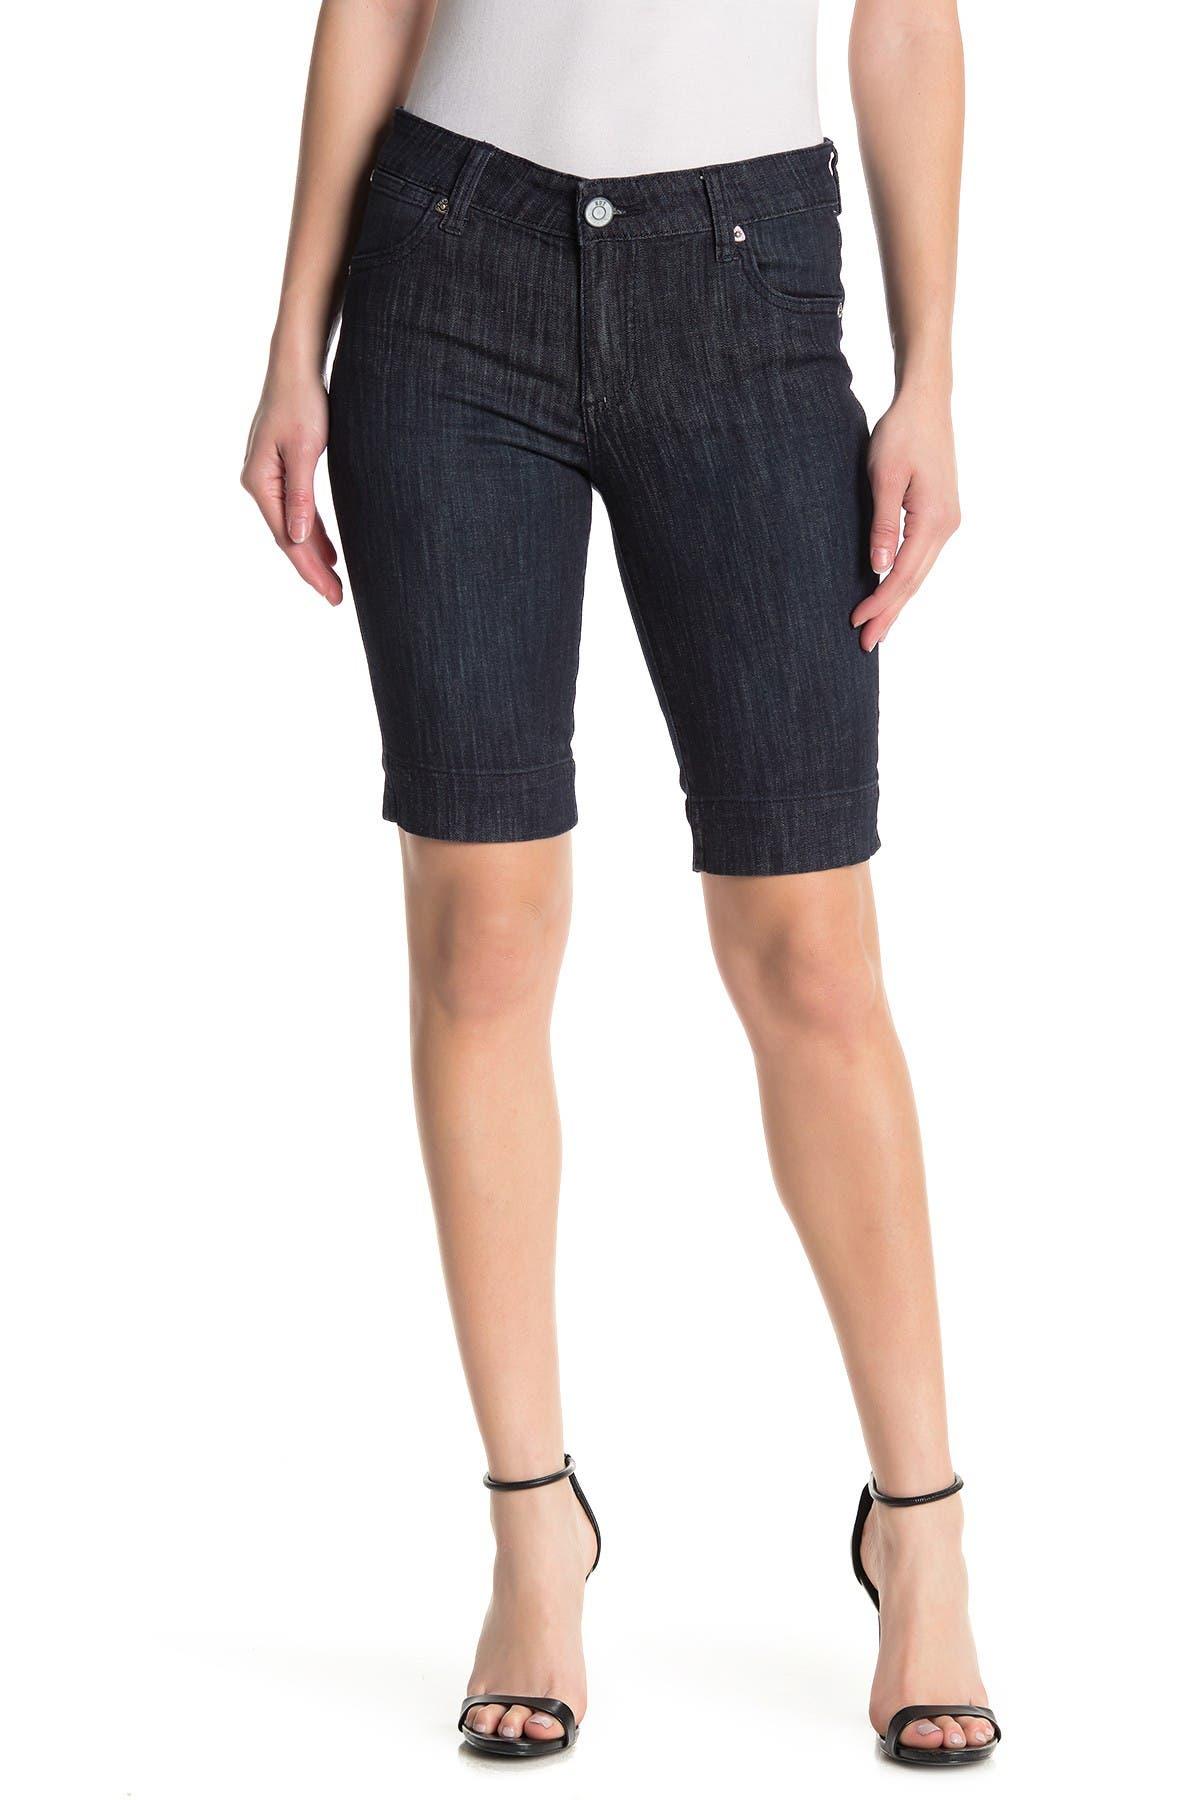 Image of KUT from the Kloth Nicole Bermuda Shorts